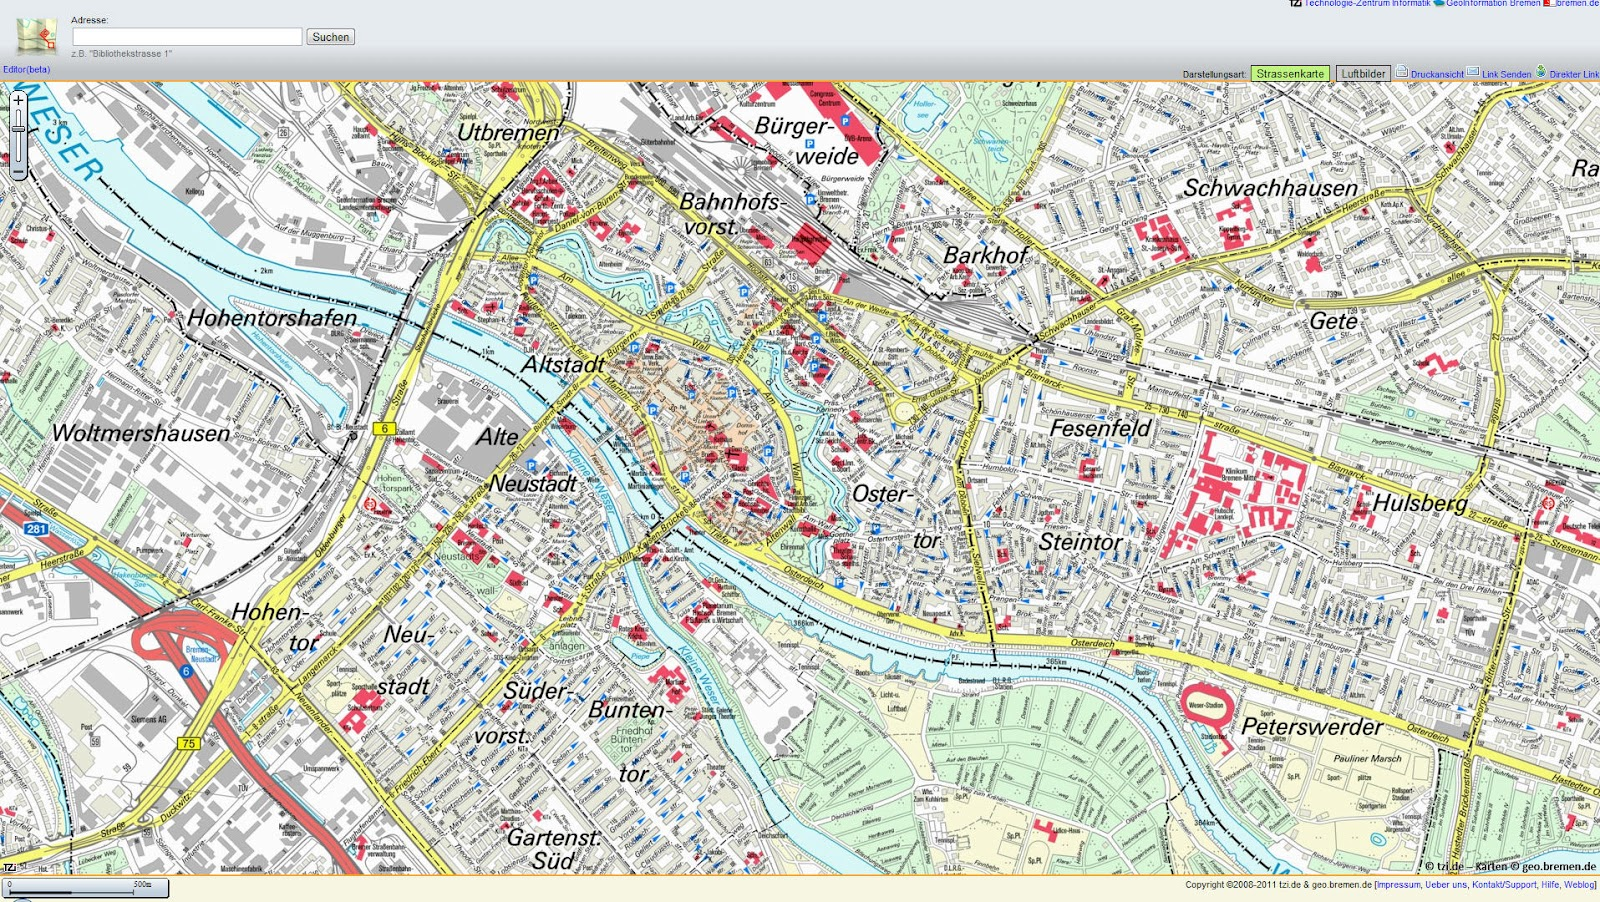 landkartenblog maps kostenlose amtliche. Black Bedroom Furniture Sets. Home Design Ideas